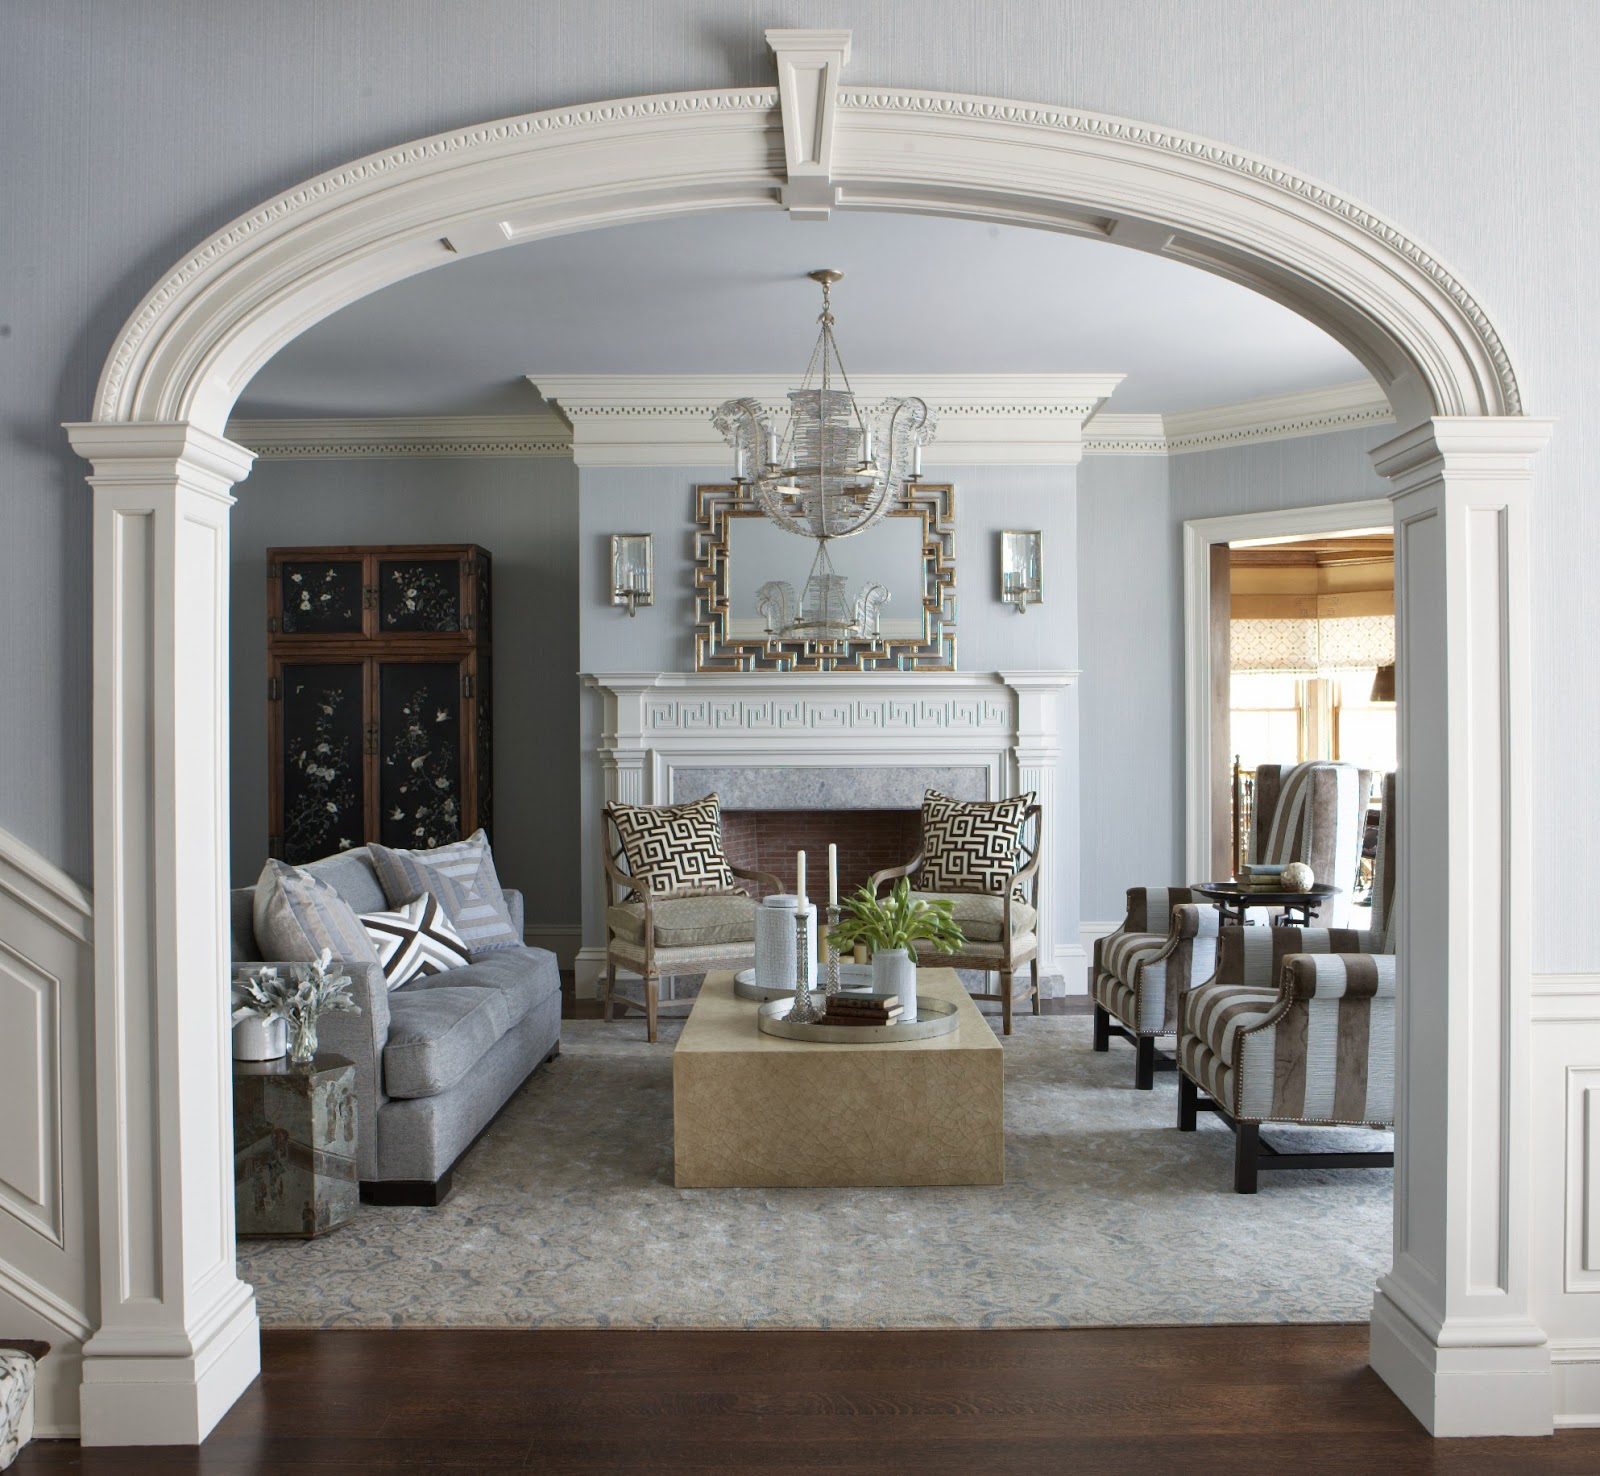 дизайн арки в интерьере квартиры лепнина